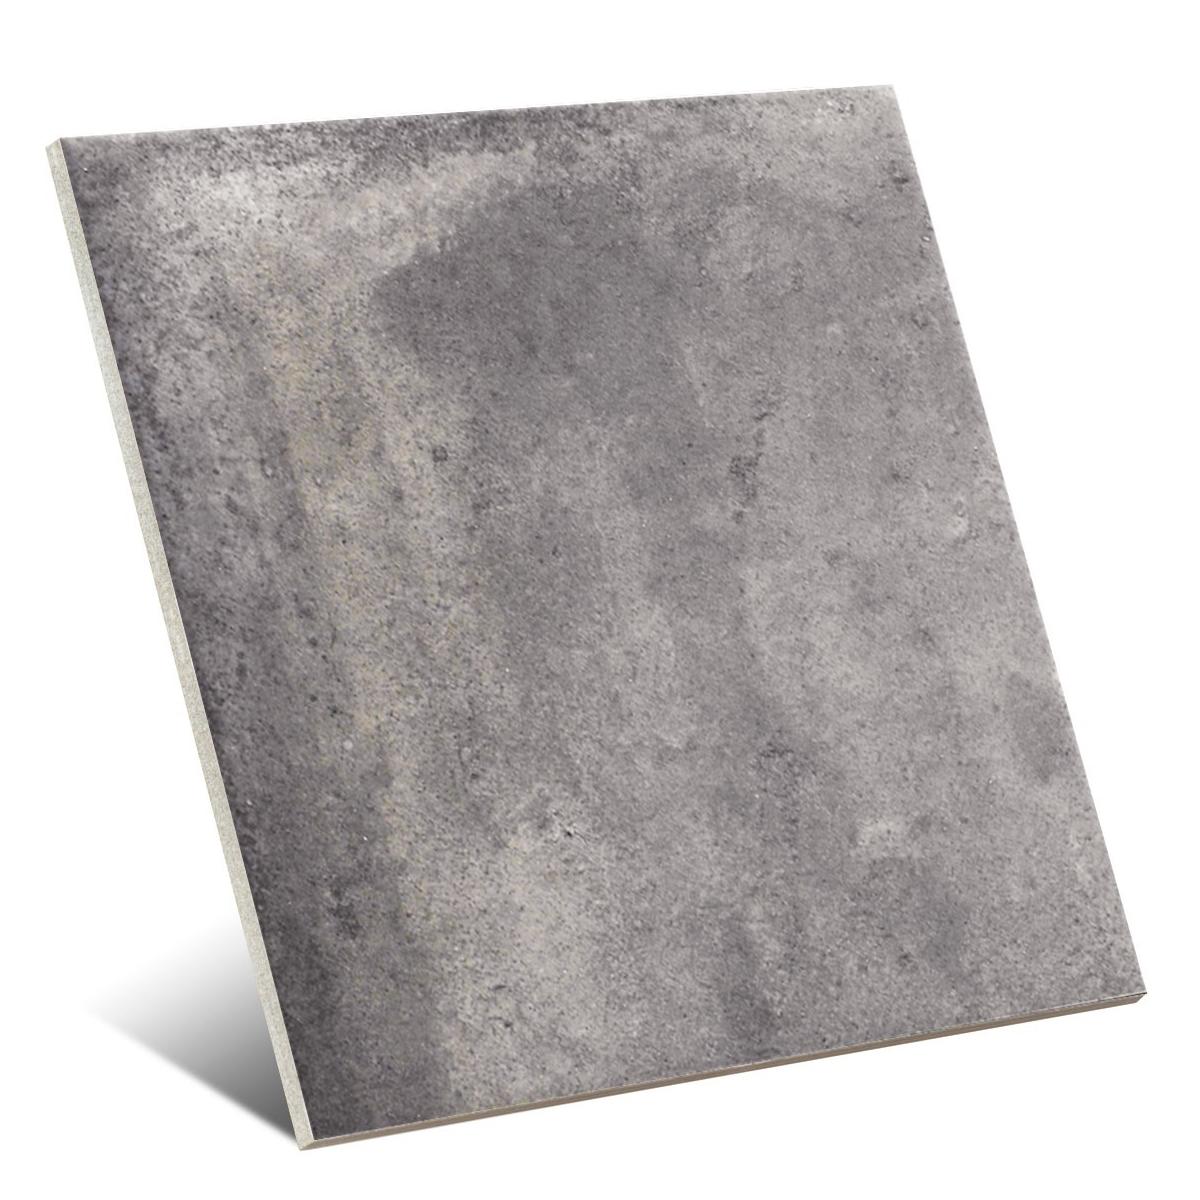 Davalos Dark 20x20 (caja 1 m2)